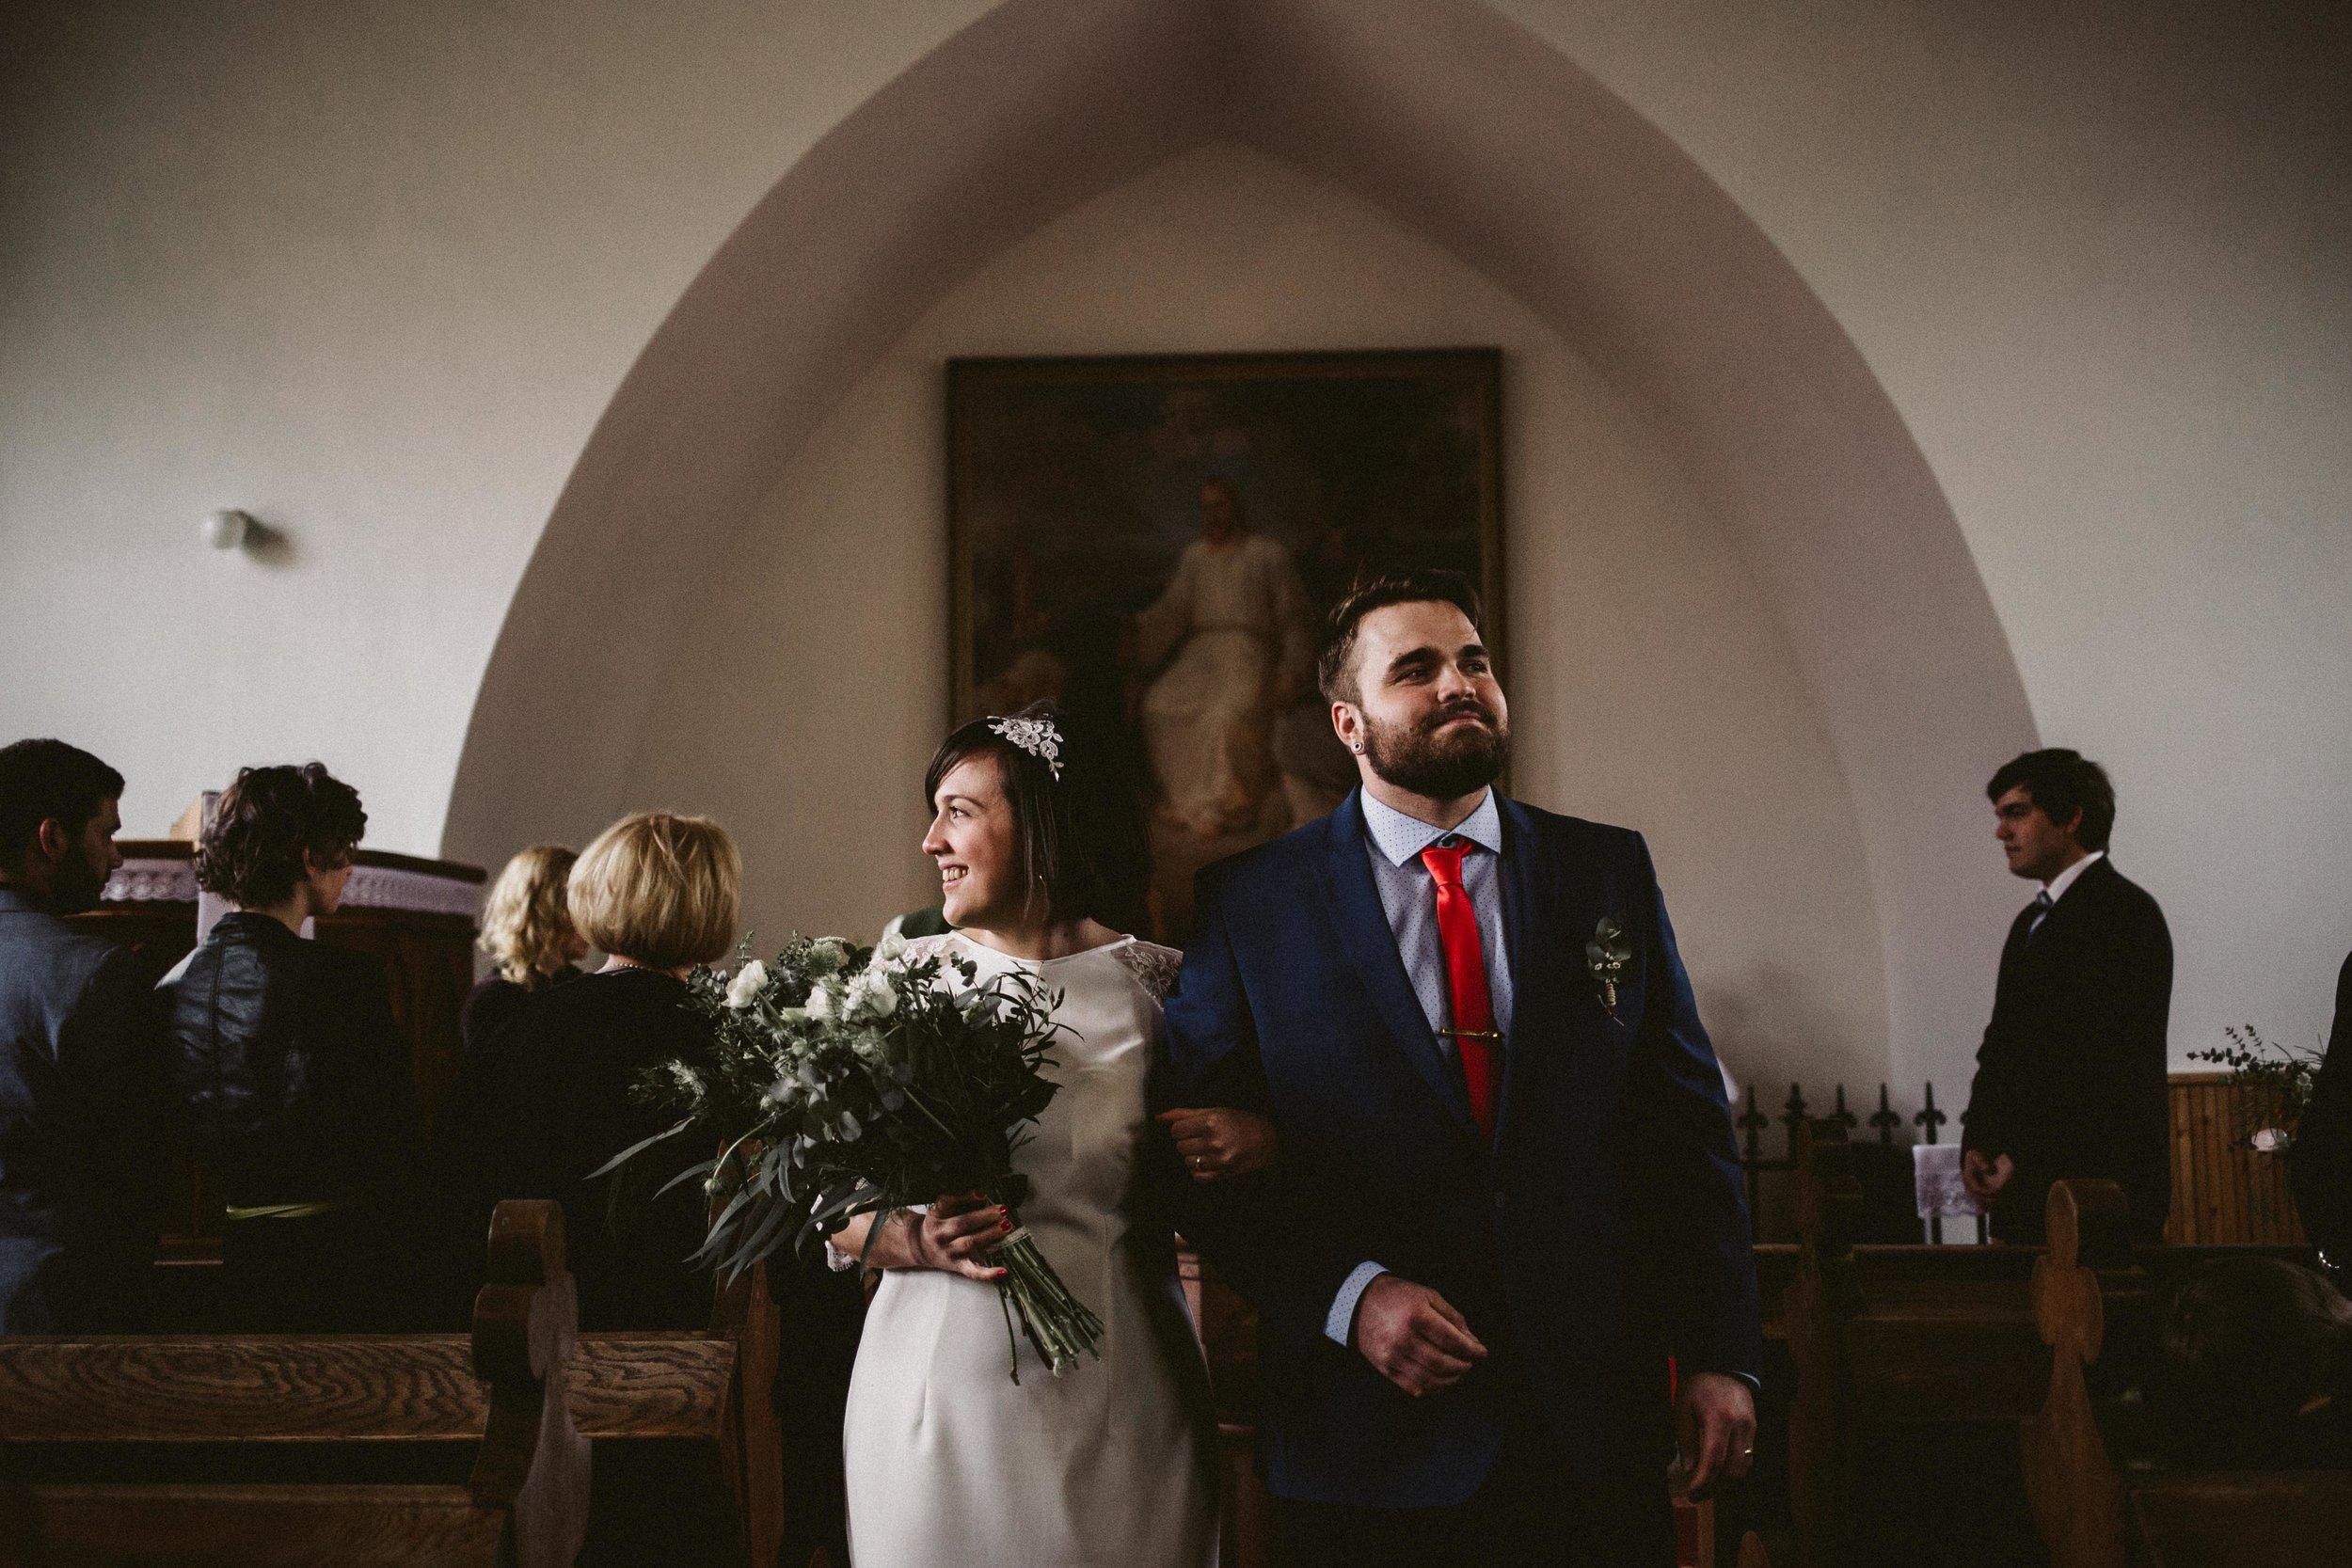 20170422_Szilvia+Pentti_wedding_w_293__MG_0546.jpg